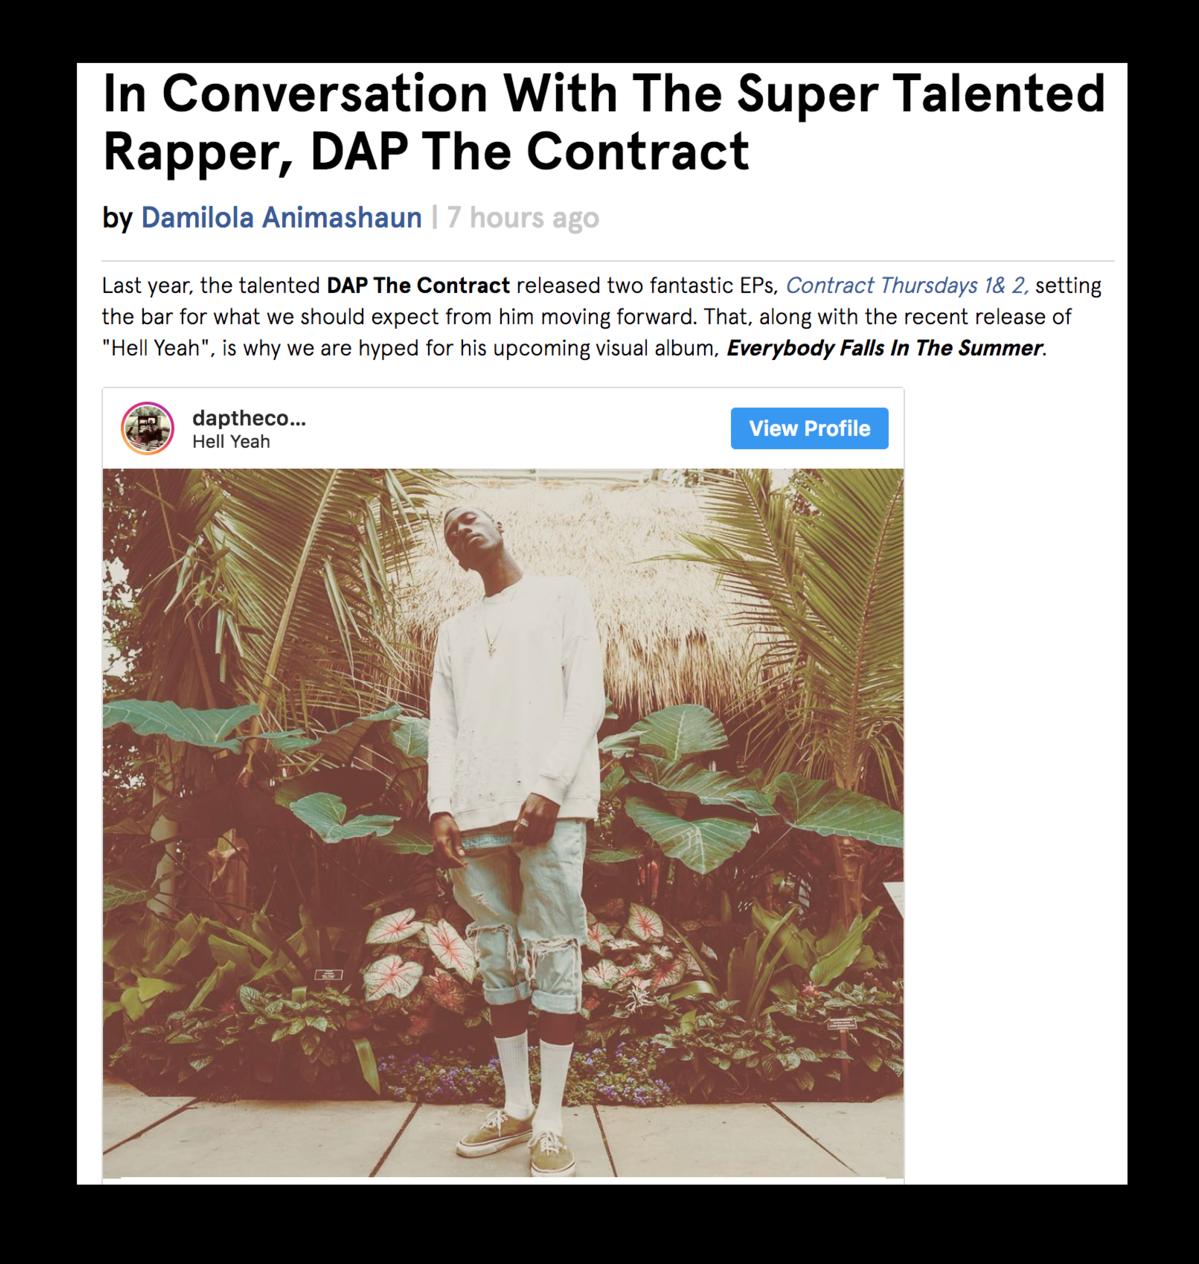 http://www.konbini.com/ng/entertainment/music/conversation-super-talented-rapper-dap-contract/